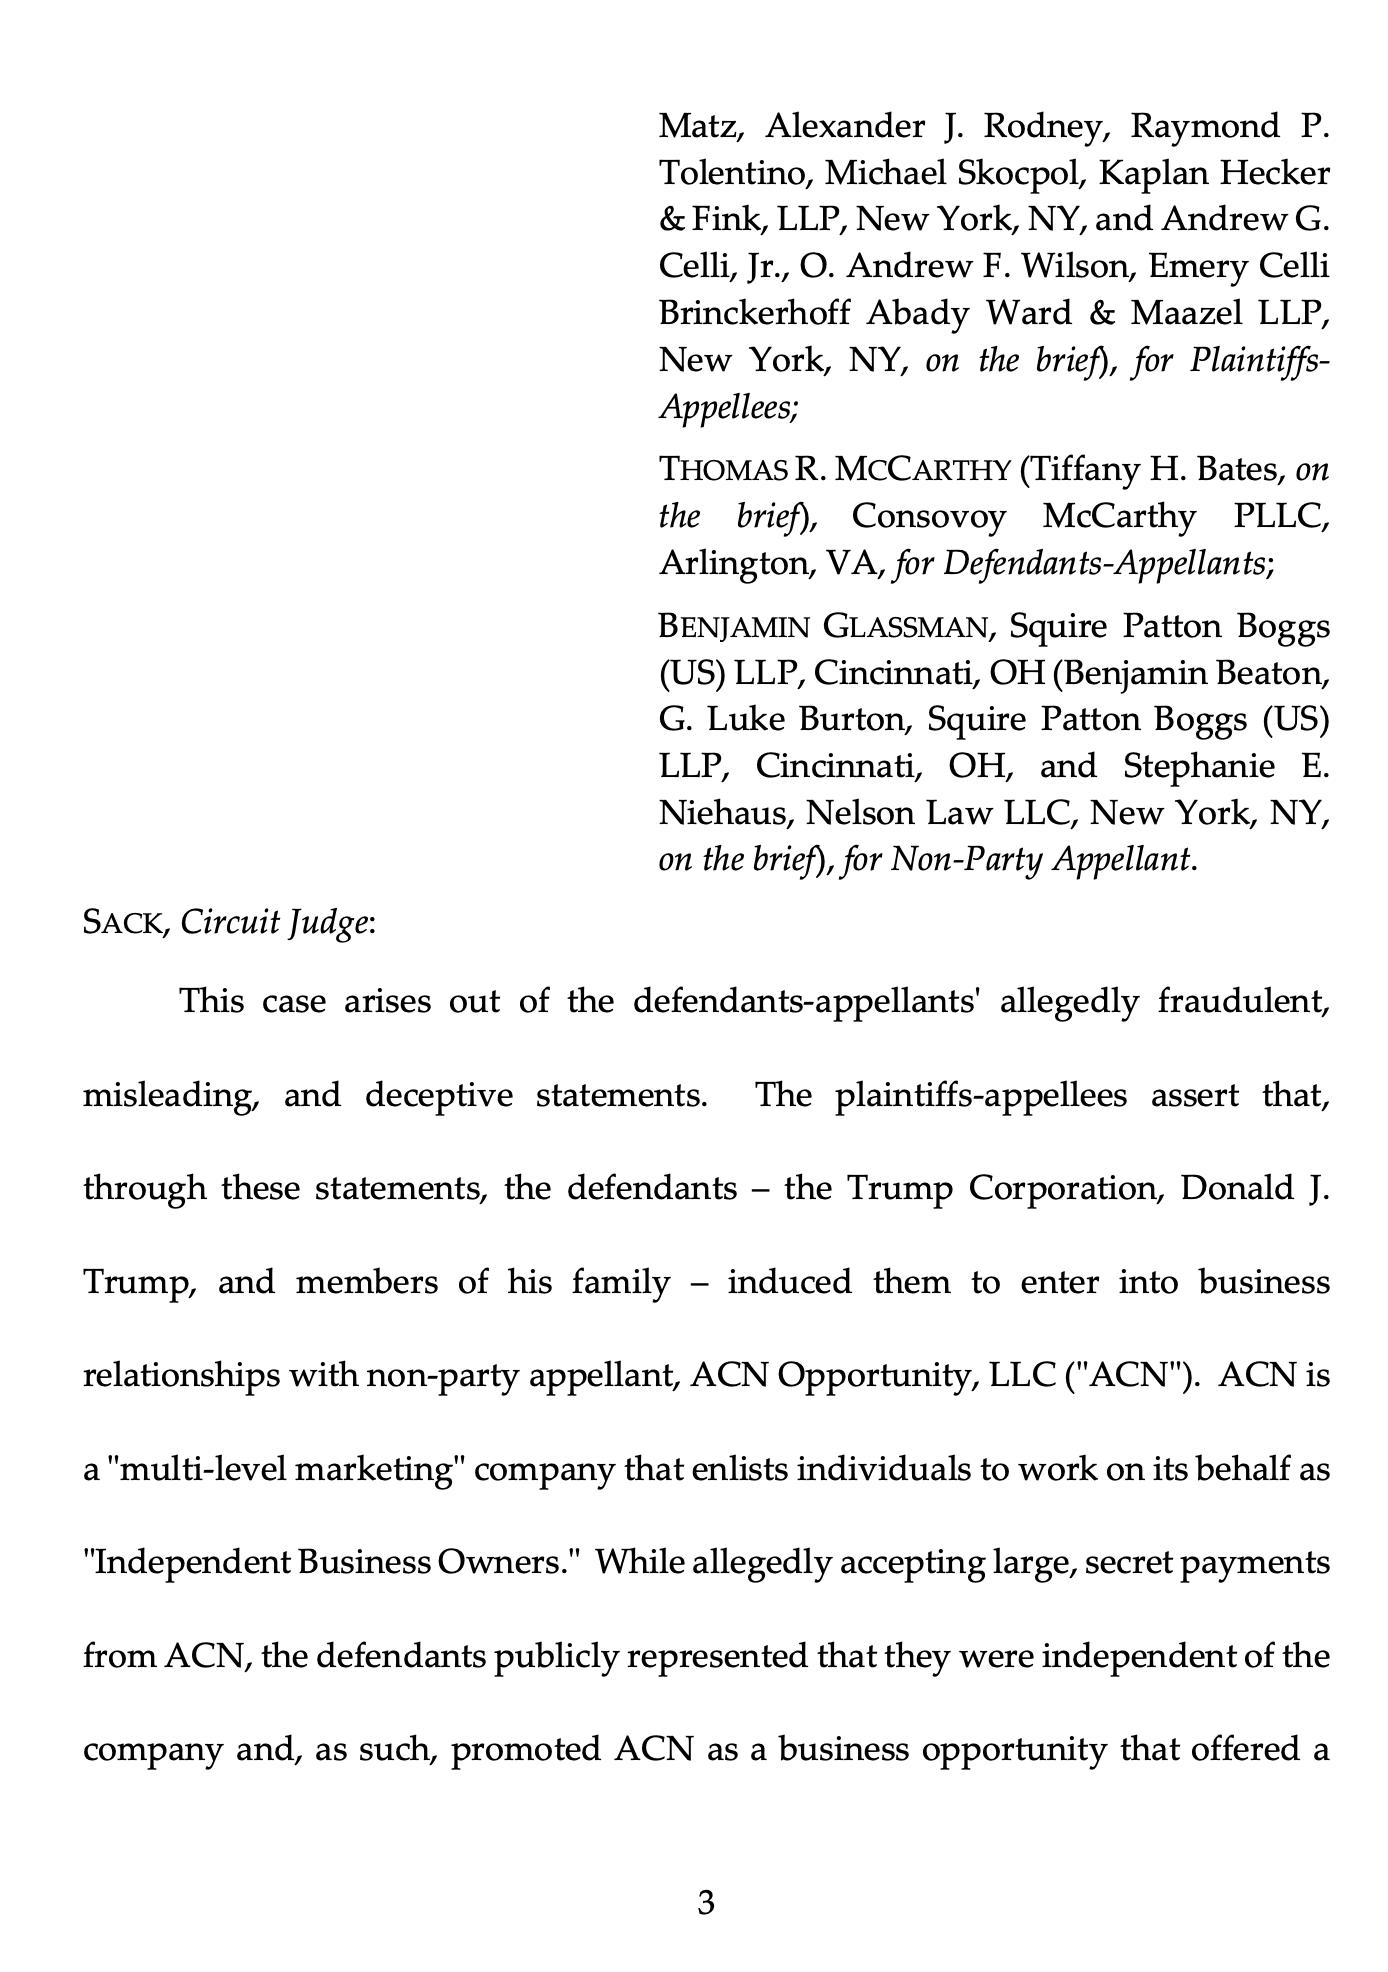 Screen-Shot-2021-07-29-at-10.02.55-AM Federal Court Rules Against Trump Children In Corruption Case Corruption Donald Trump Featured Politics Top Stories